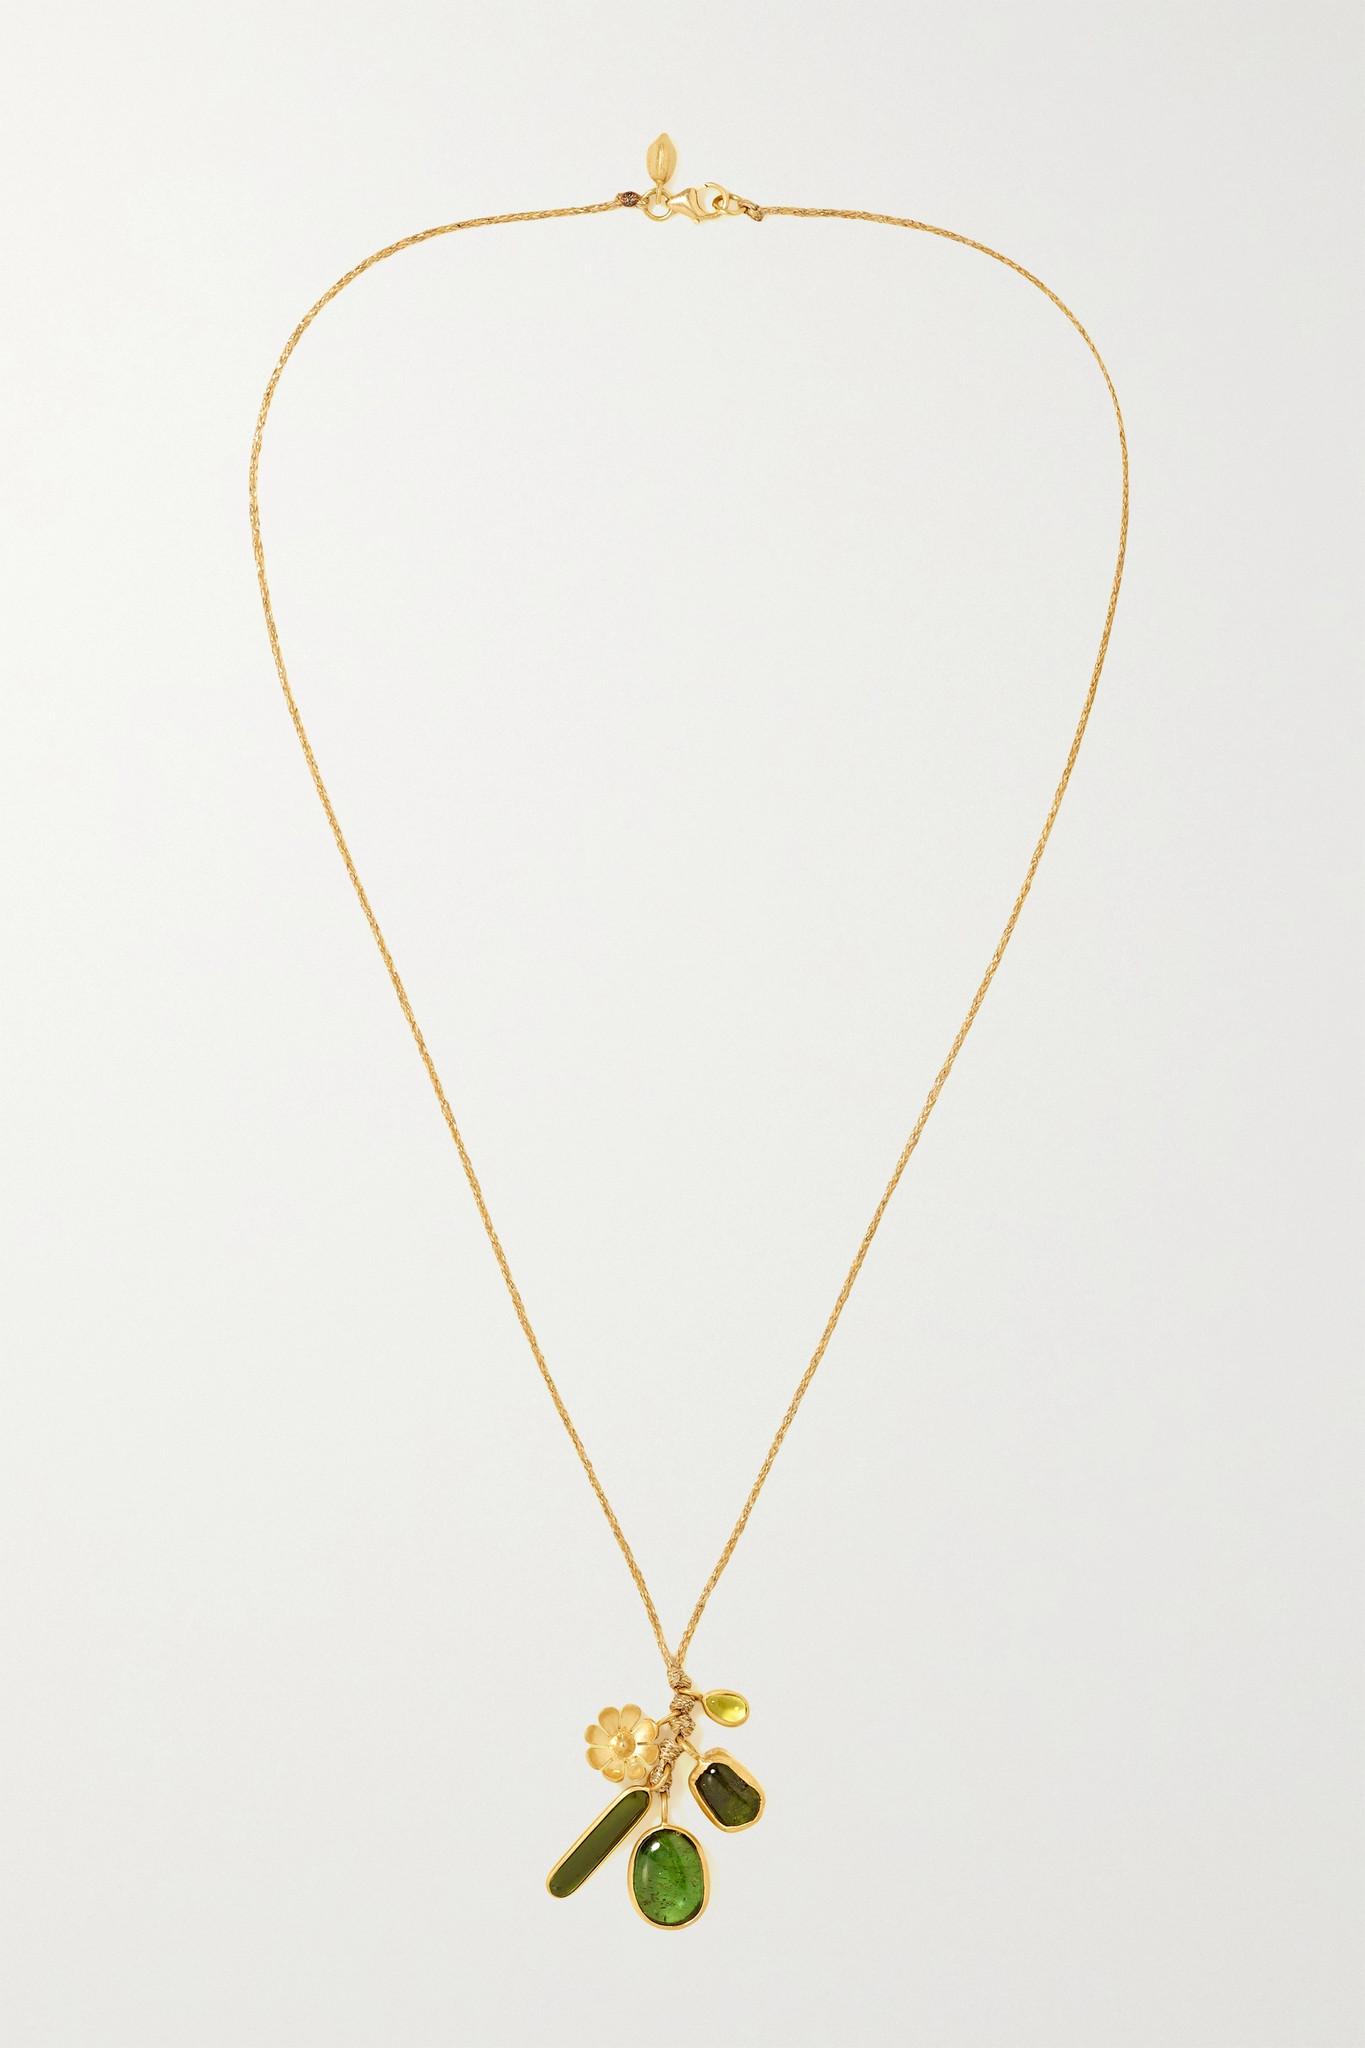 PIPPA SMALL - 18k 黄金、碧玺、编绳项链 - 金色 - one size